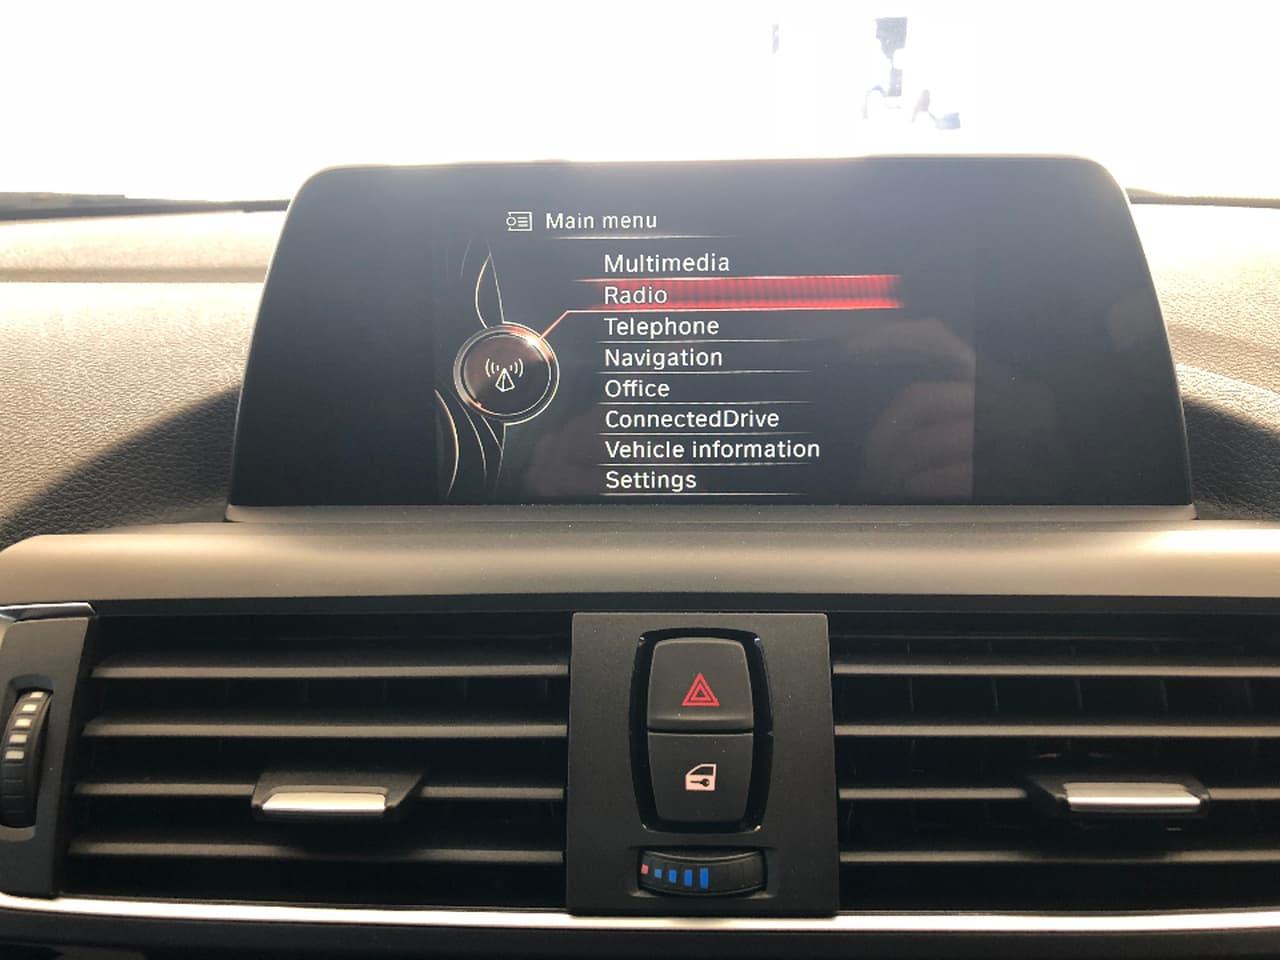 2016 BMW 1 Series F20 LCI M Sport Hatchback